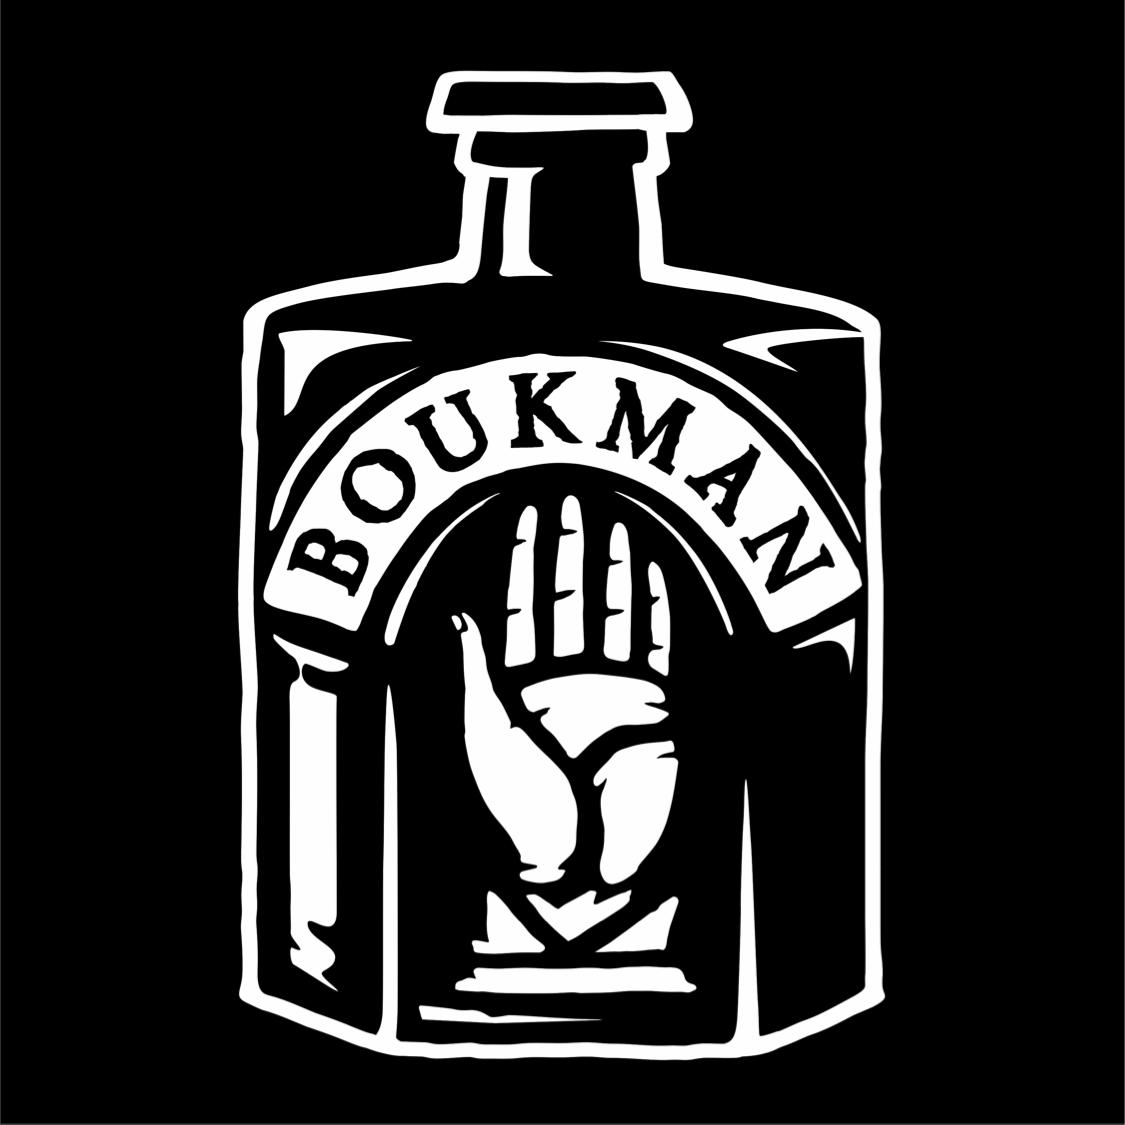 Boukman Instagram logo.png